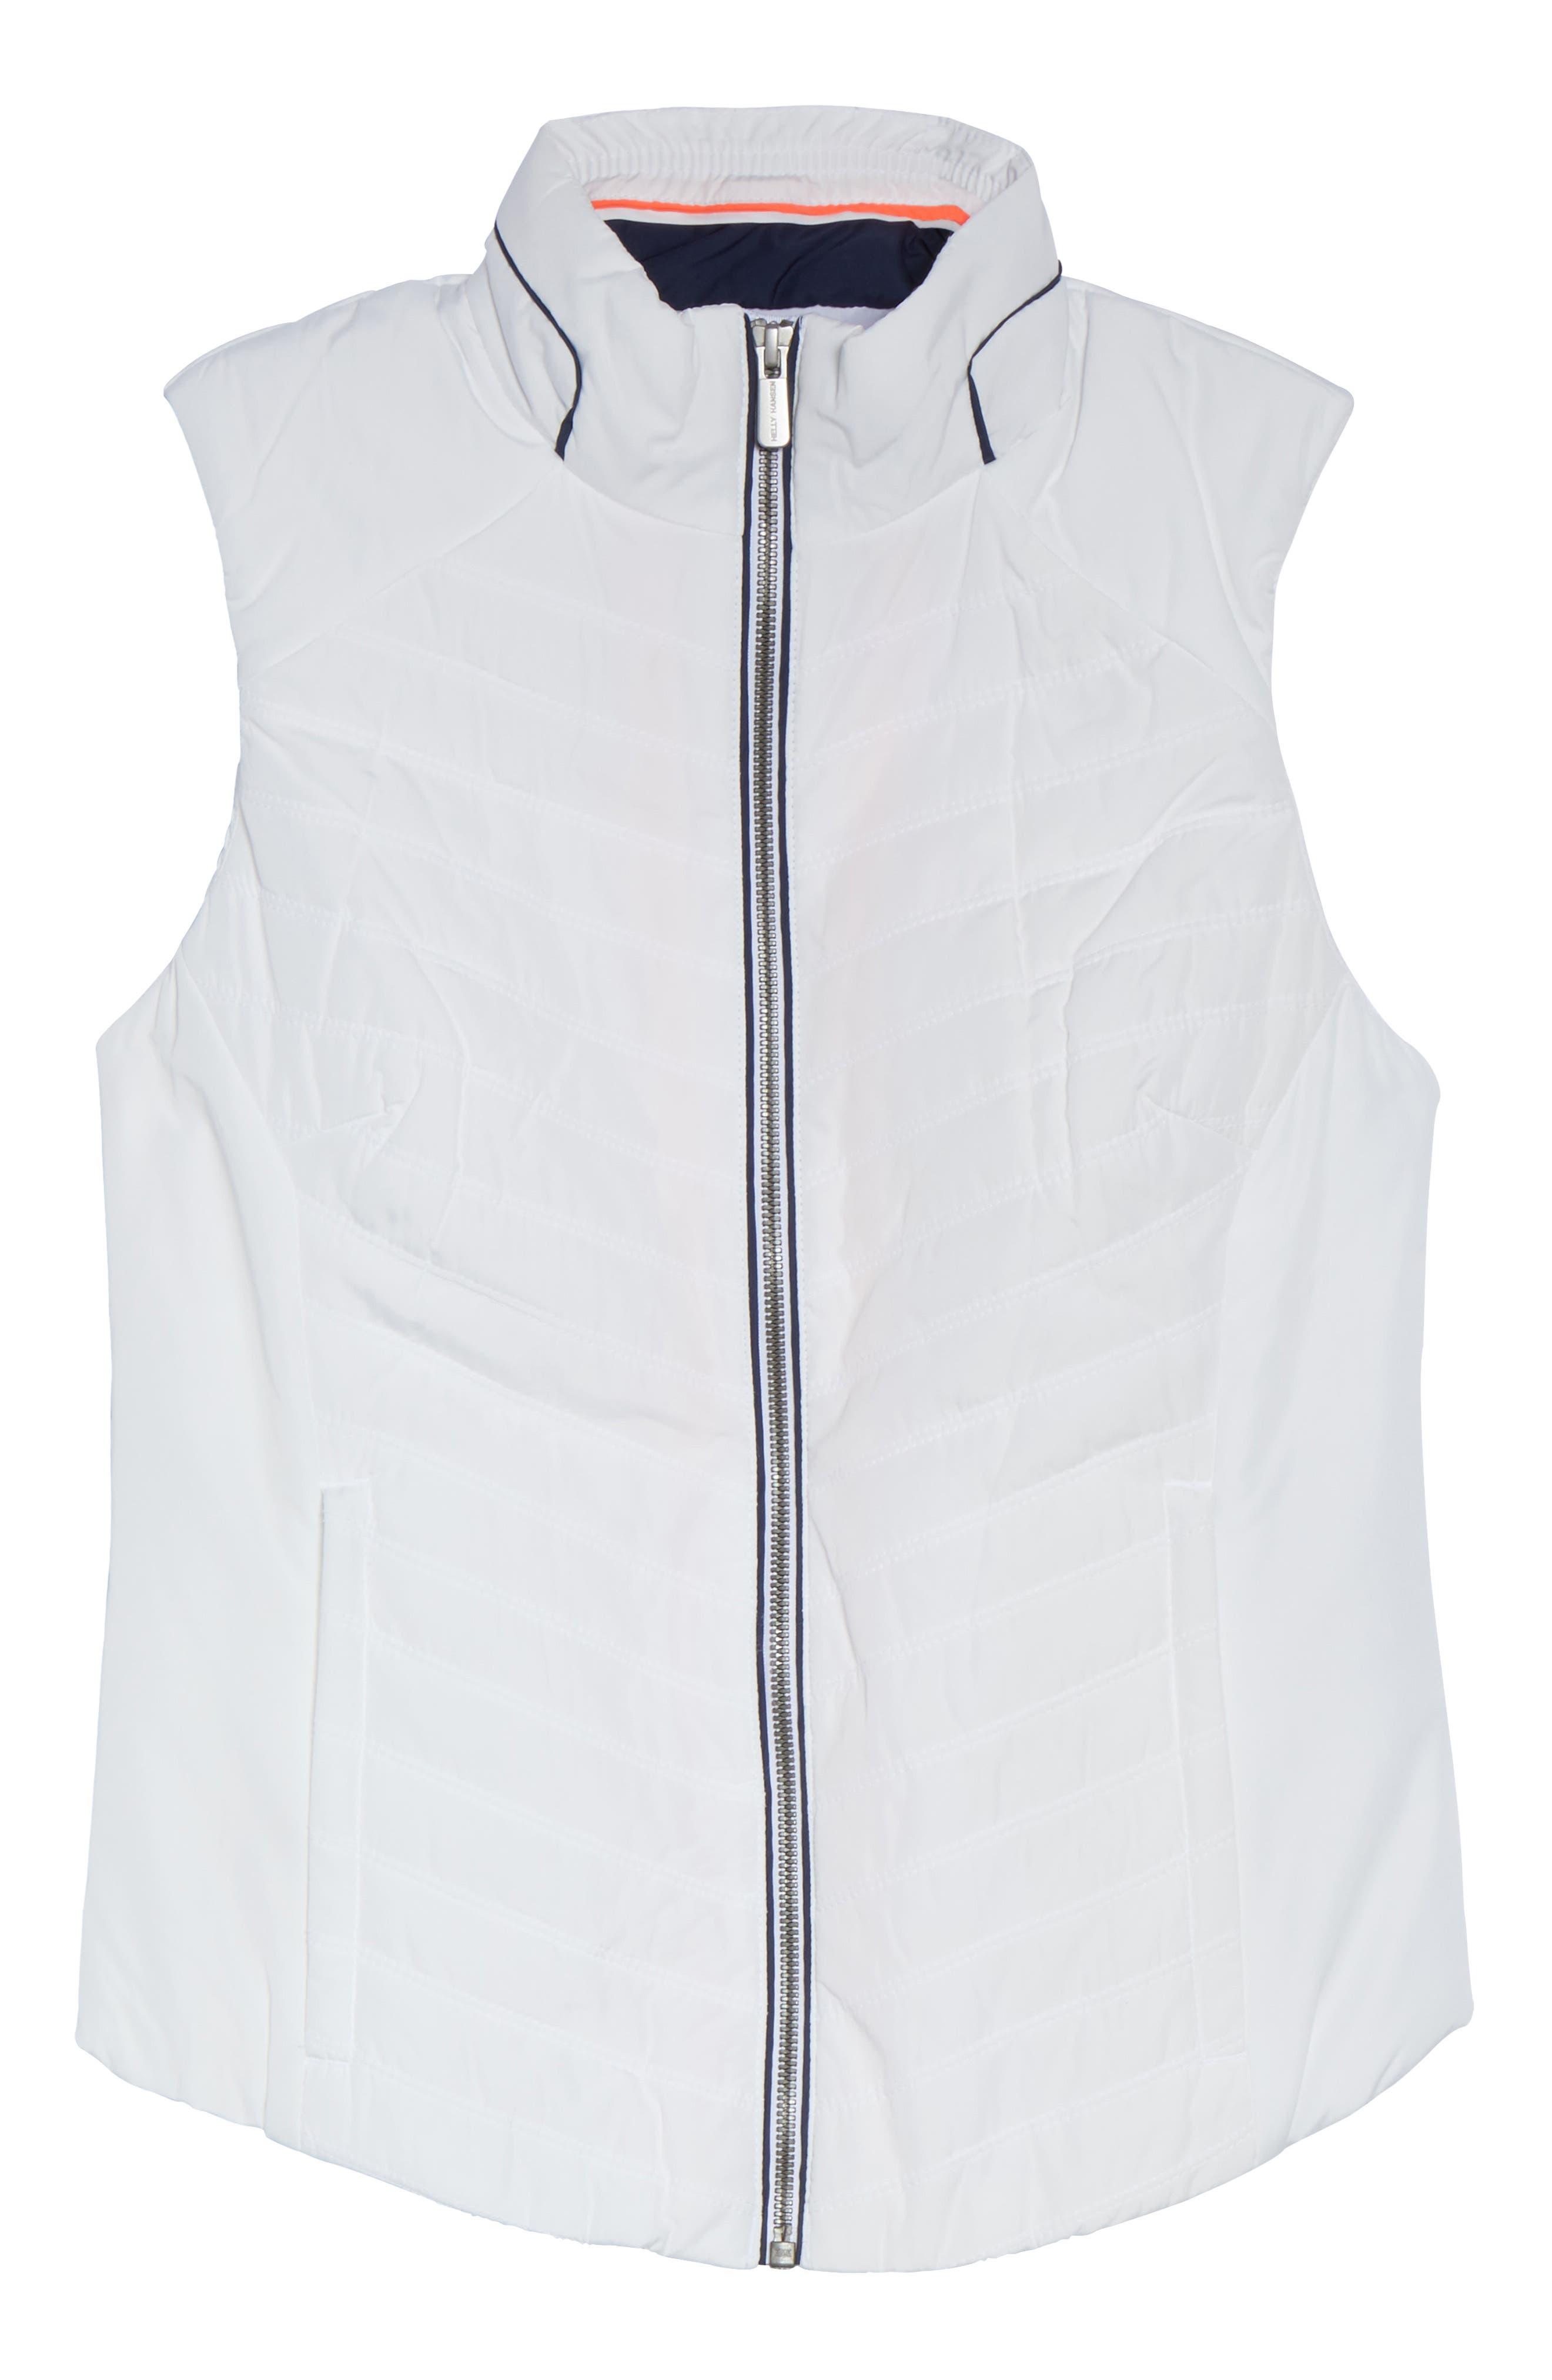 Crew Insulator Vest,                             Alternate thumbnail 6, color,                             100